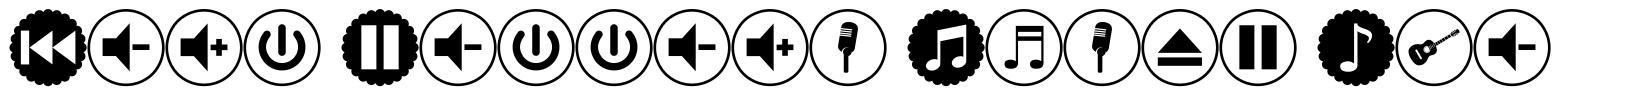 Font Bottons Music Pro